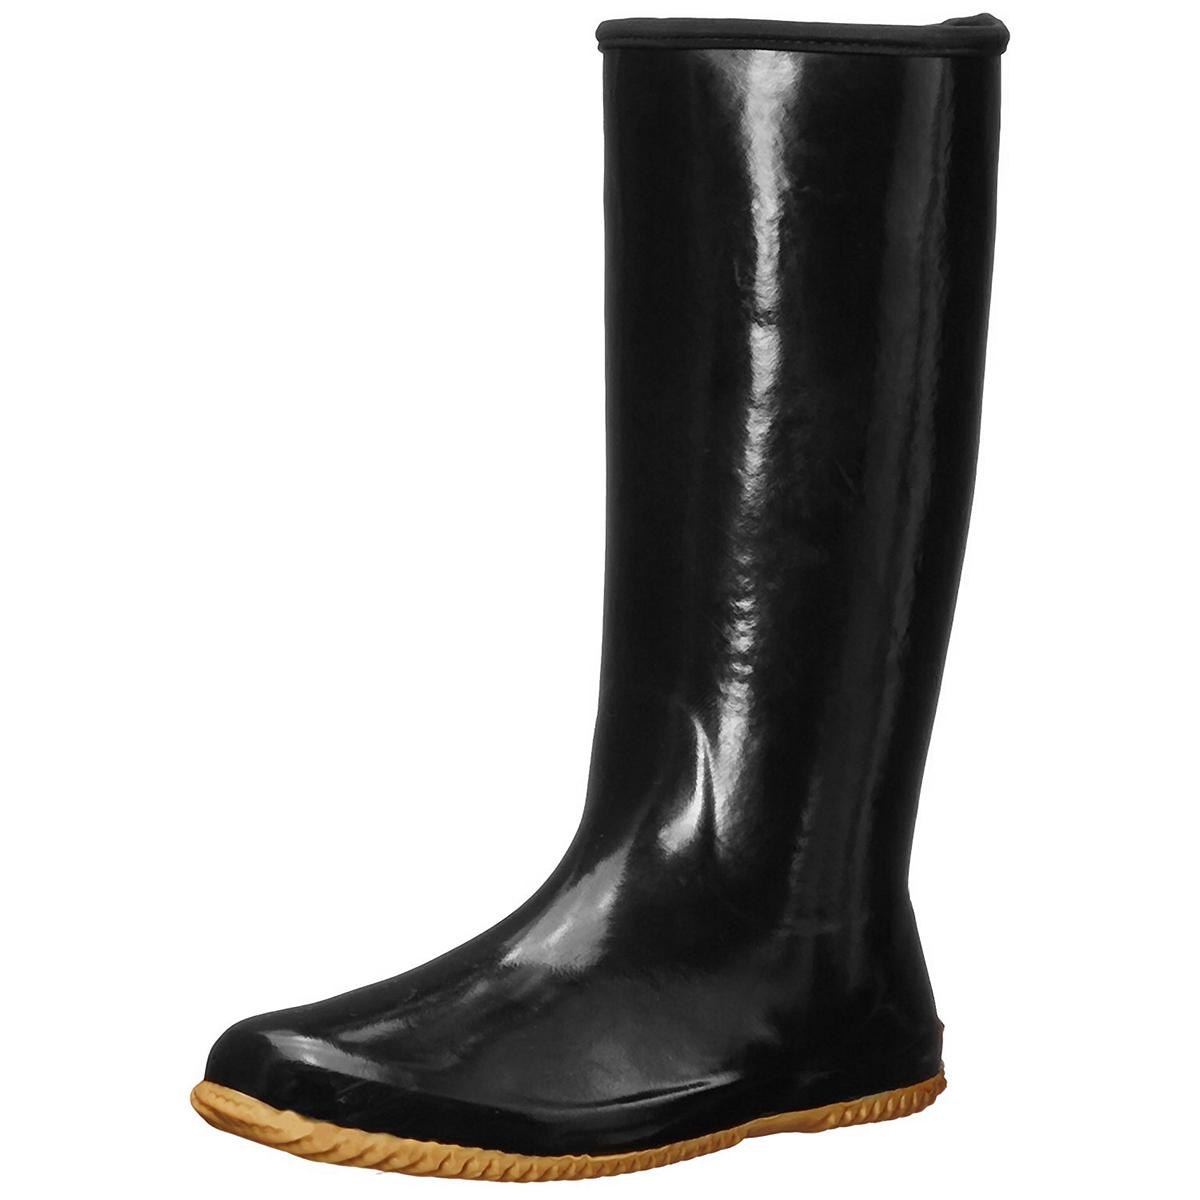 Chooka-Women-039-s-Rubber-Rain-Boots-Mid-Calf-With-Lightweight-Packable-Travel-Bag thumbnail 10